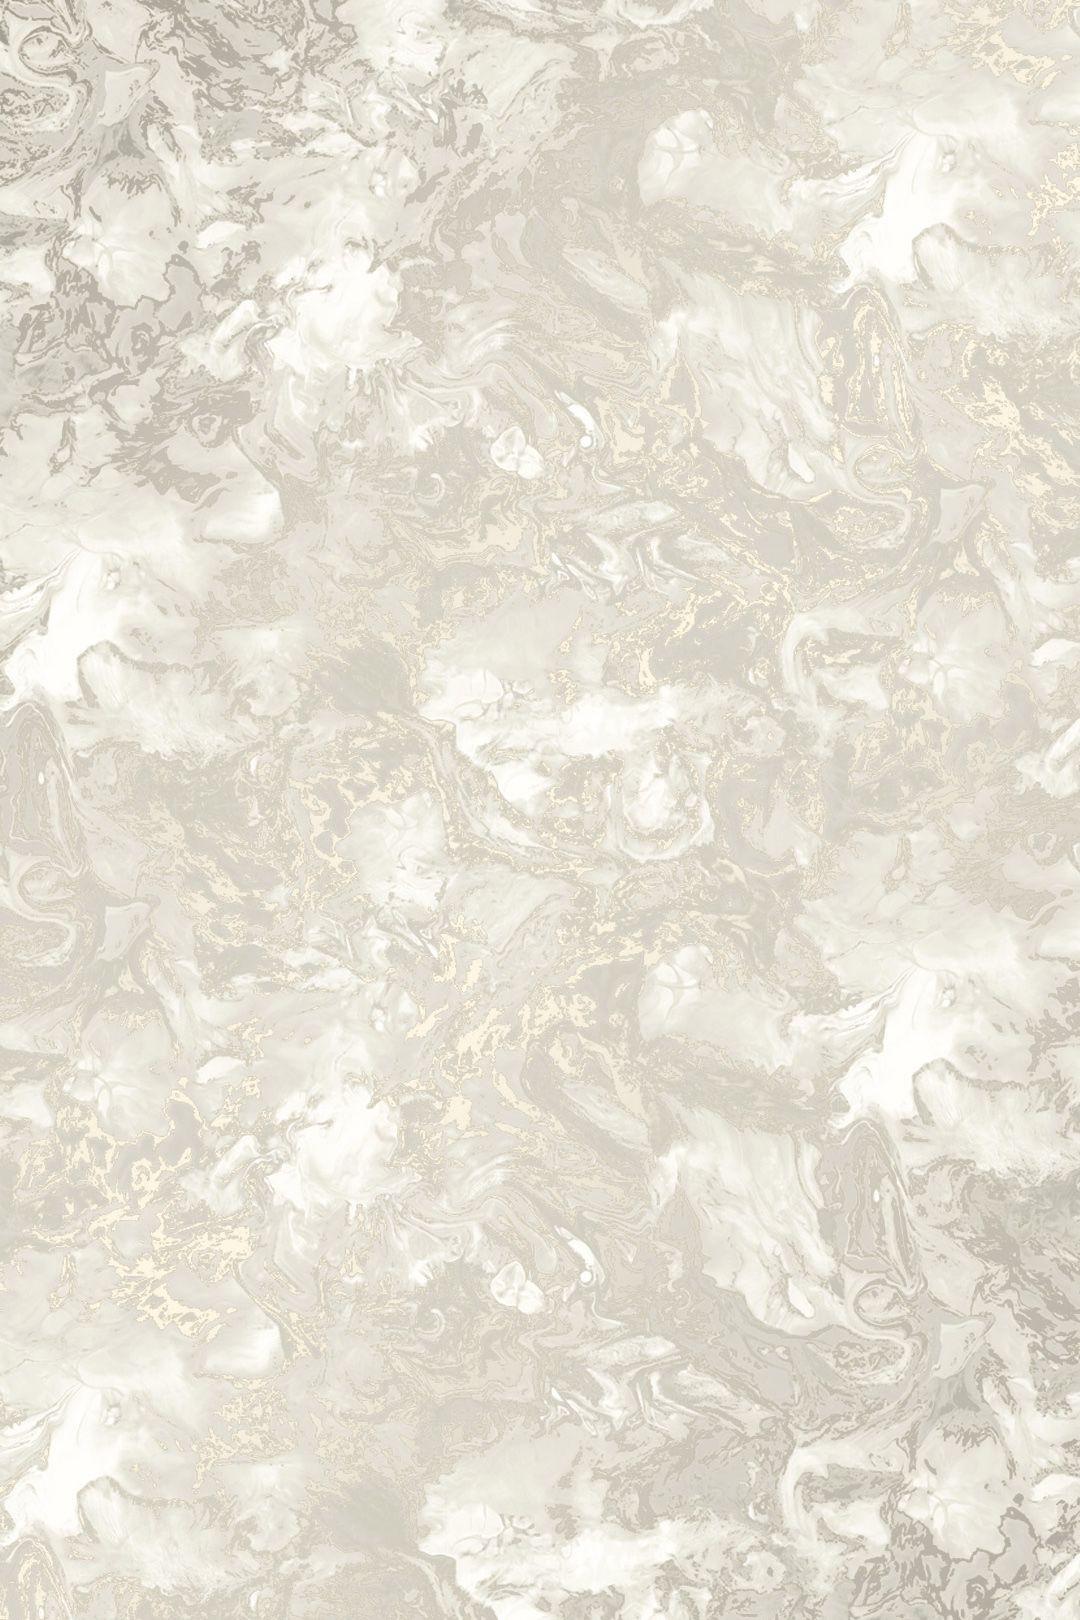 Liquid Marble Wallpaper Cream Marble wallpaper, Love